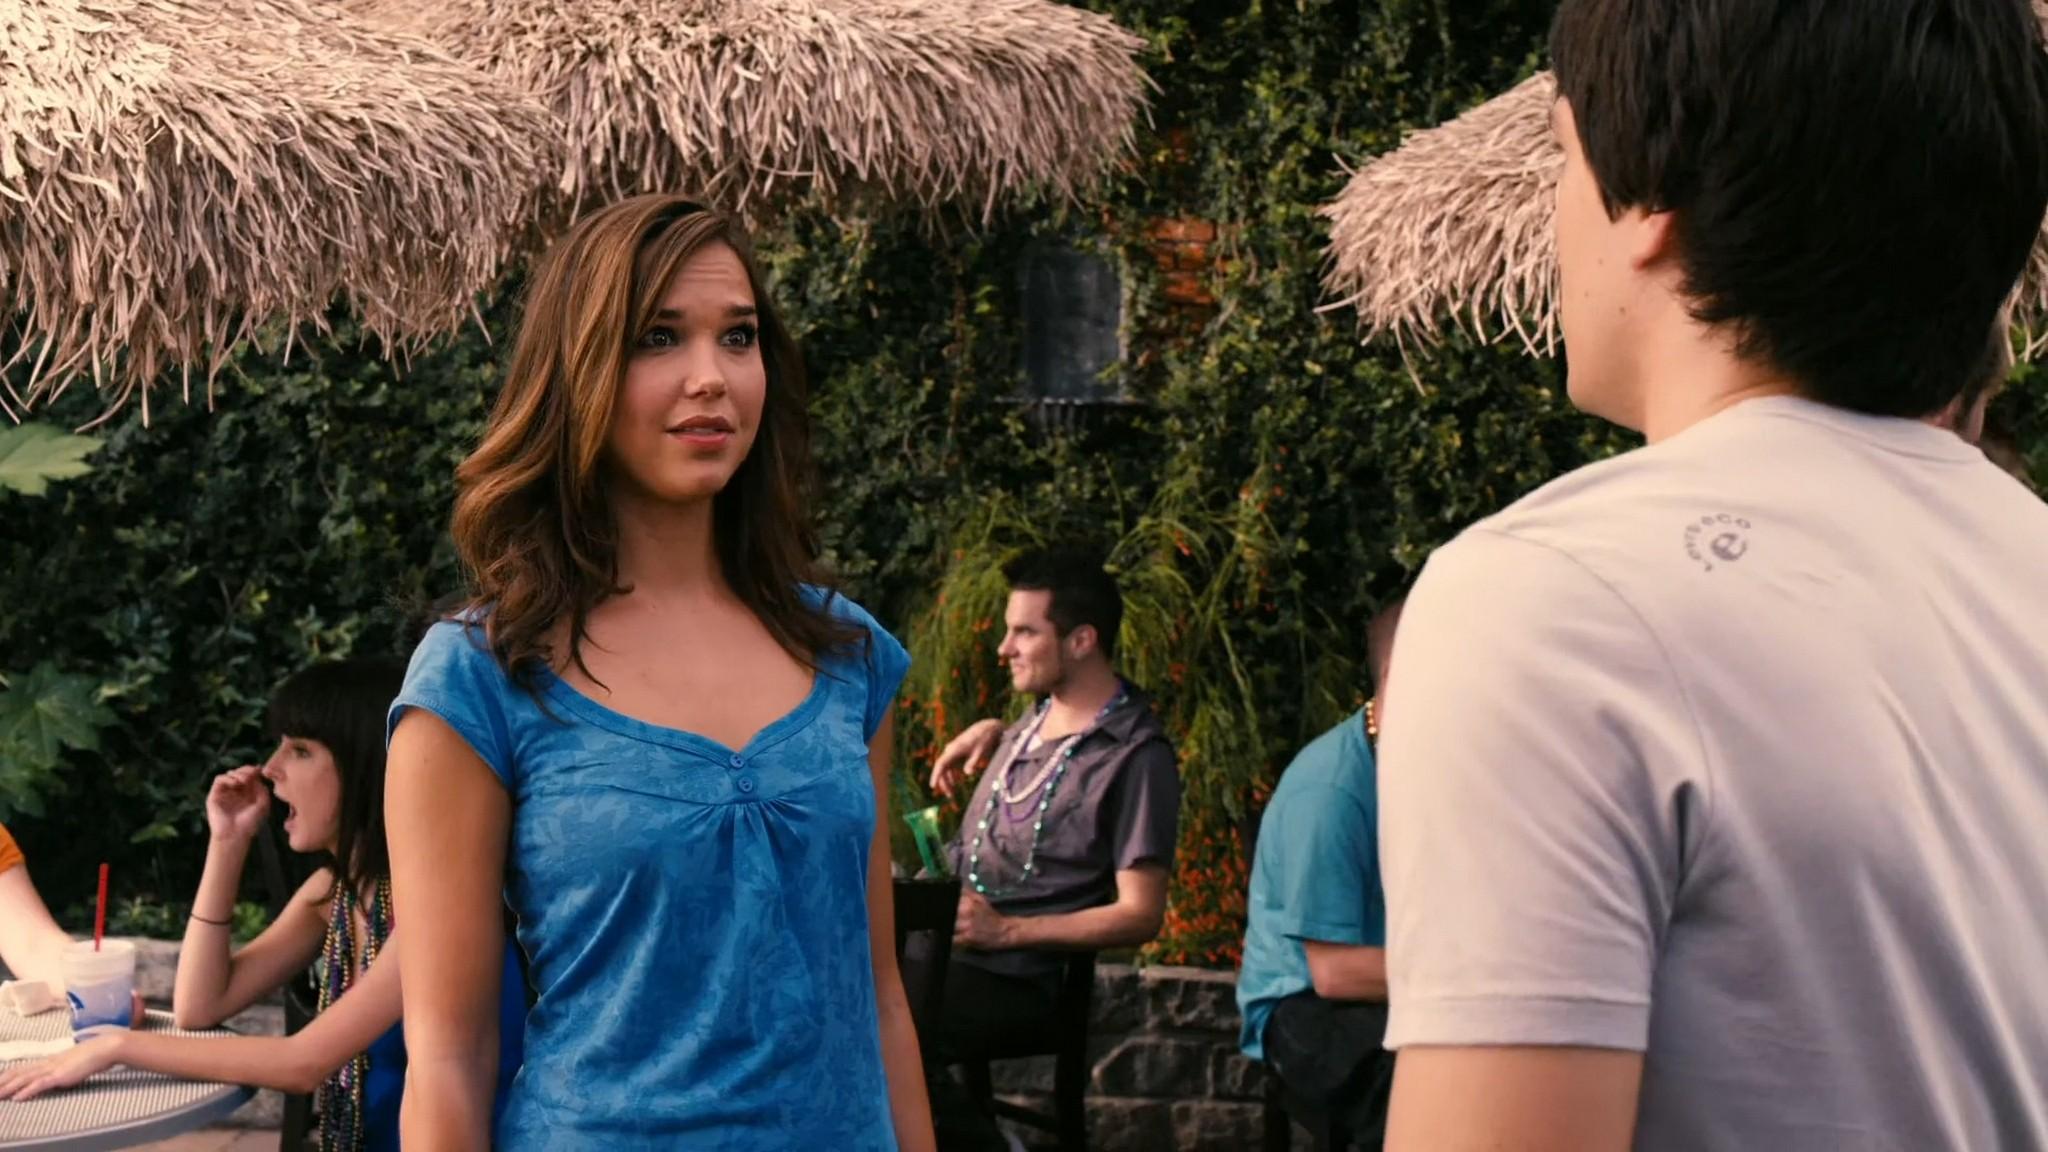 Danneel Ackles nude Carmen Electra, Arielle Kebbel, sexy otherrs nude and hot - Mardi Gras: Spring Break (2011) HD 1080p WEb (26)